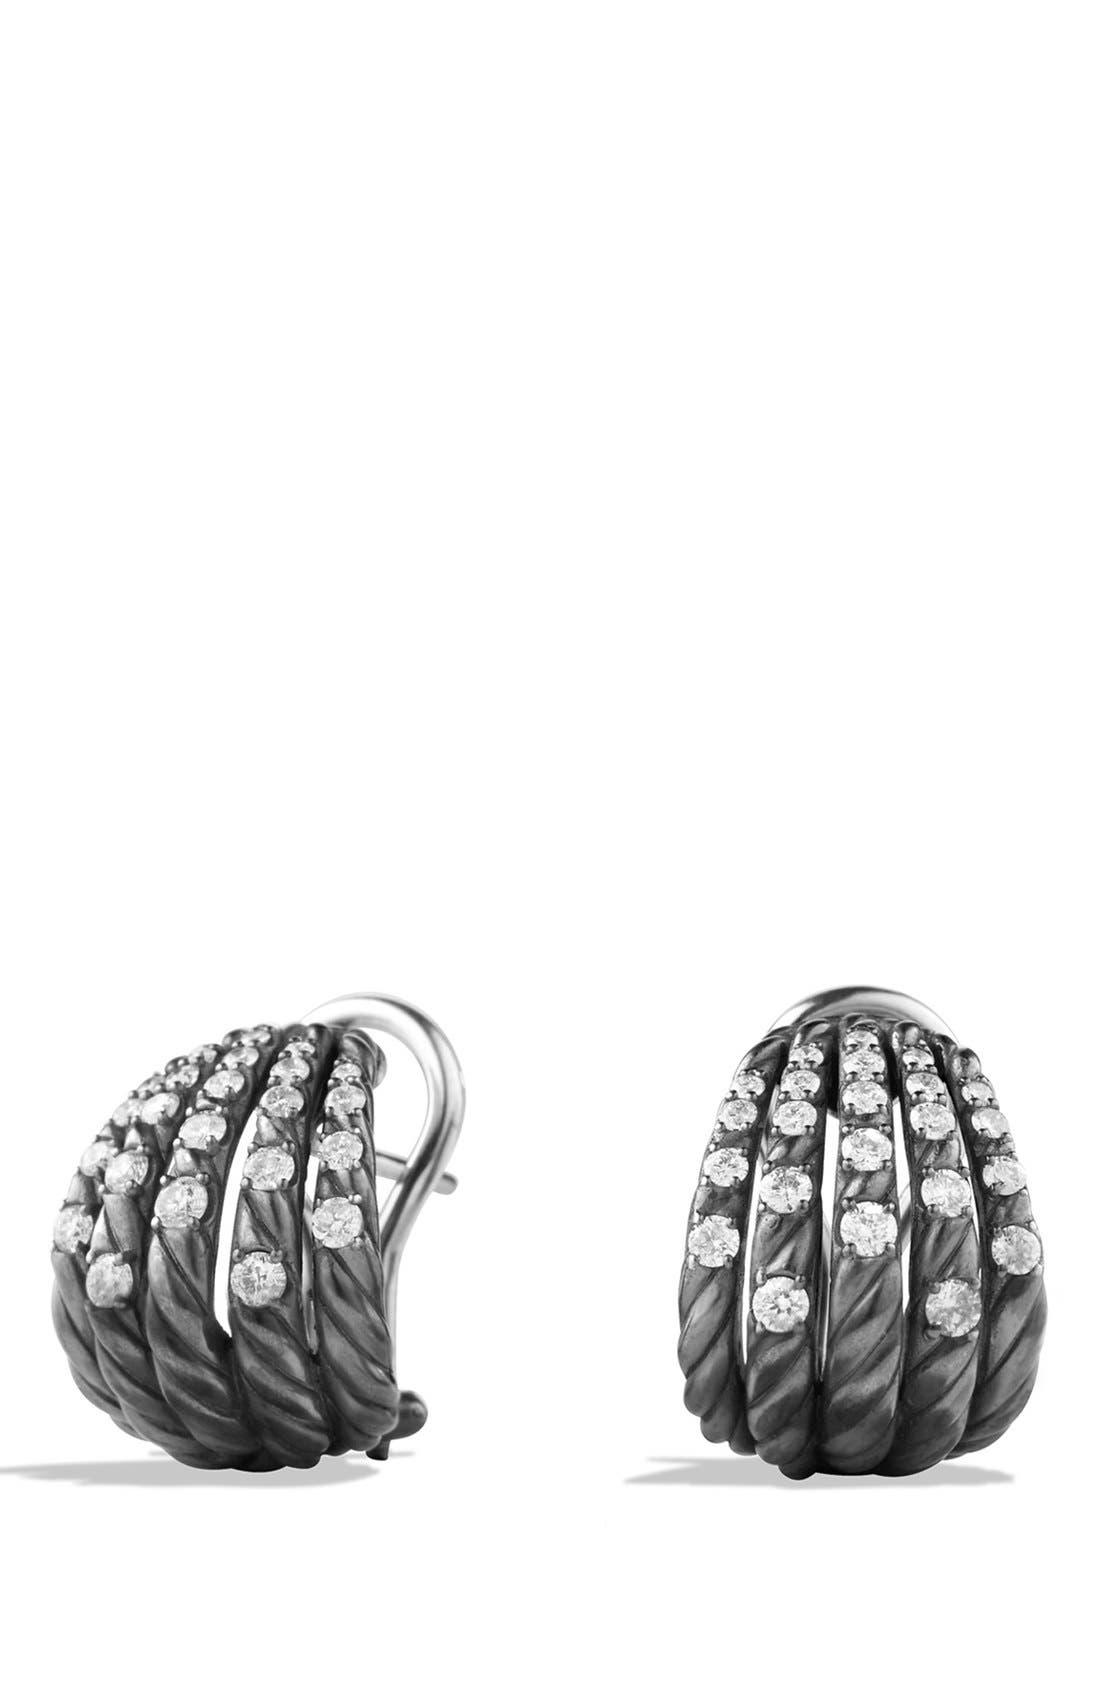 'Tempo' Earrings with Diamonds,                             Main thumbnail 1, color,                             DIAMOND